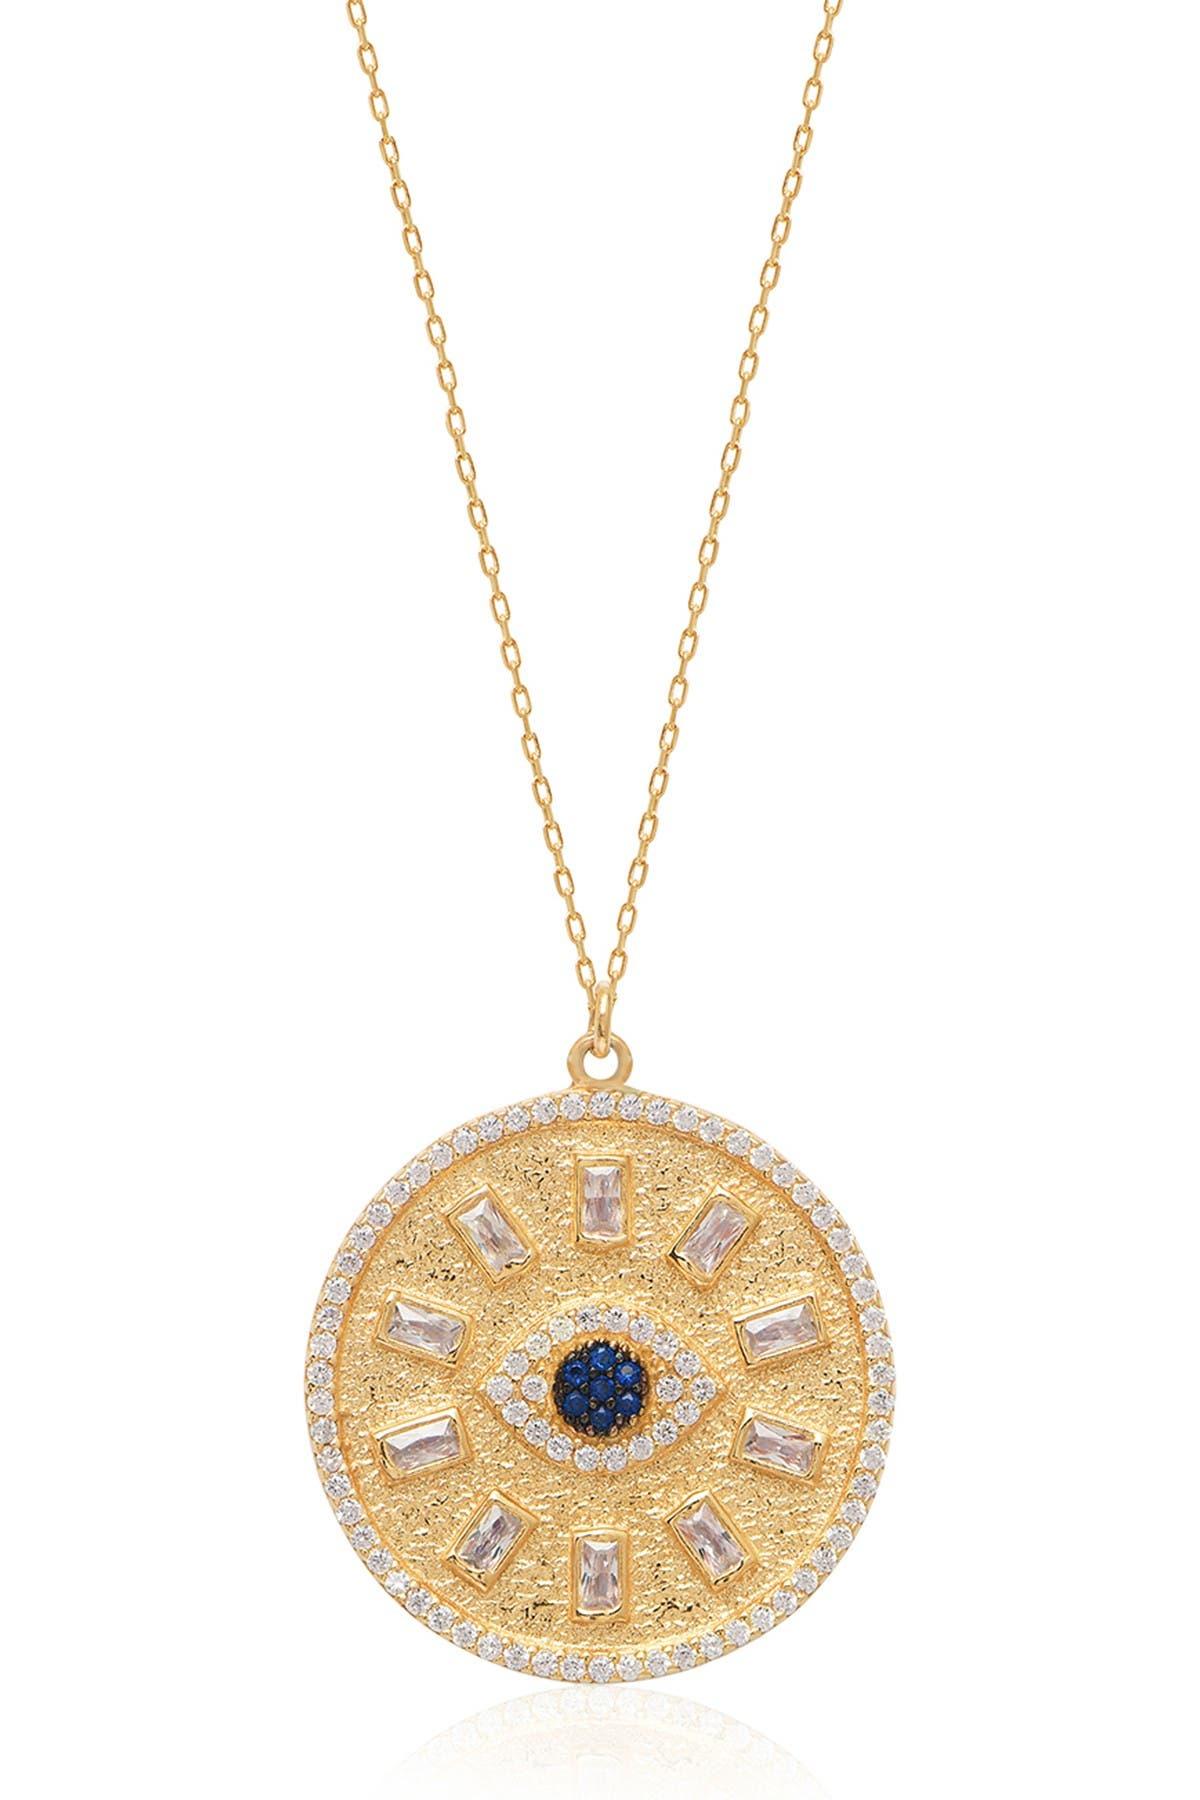 Image of Gabi Rielle Baguette & Evil Eye Necklace